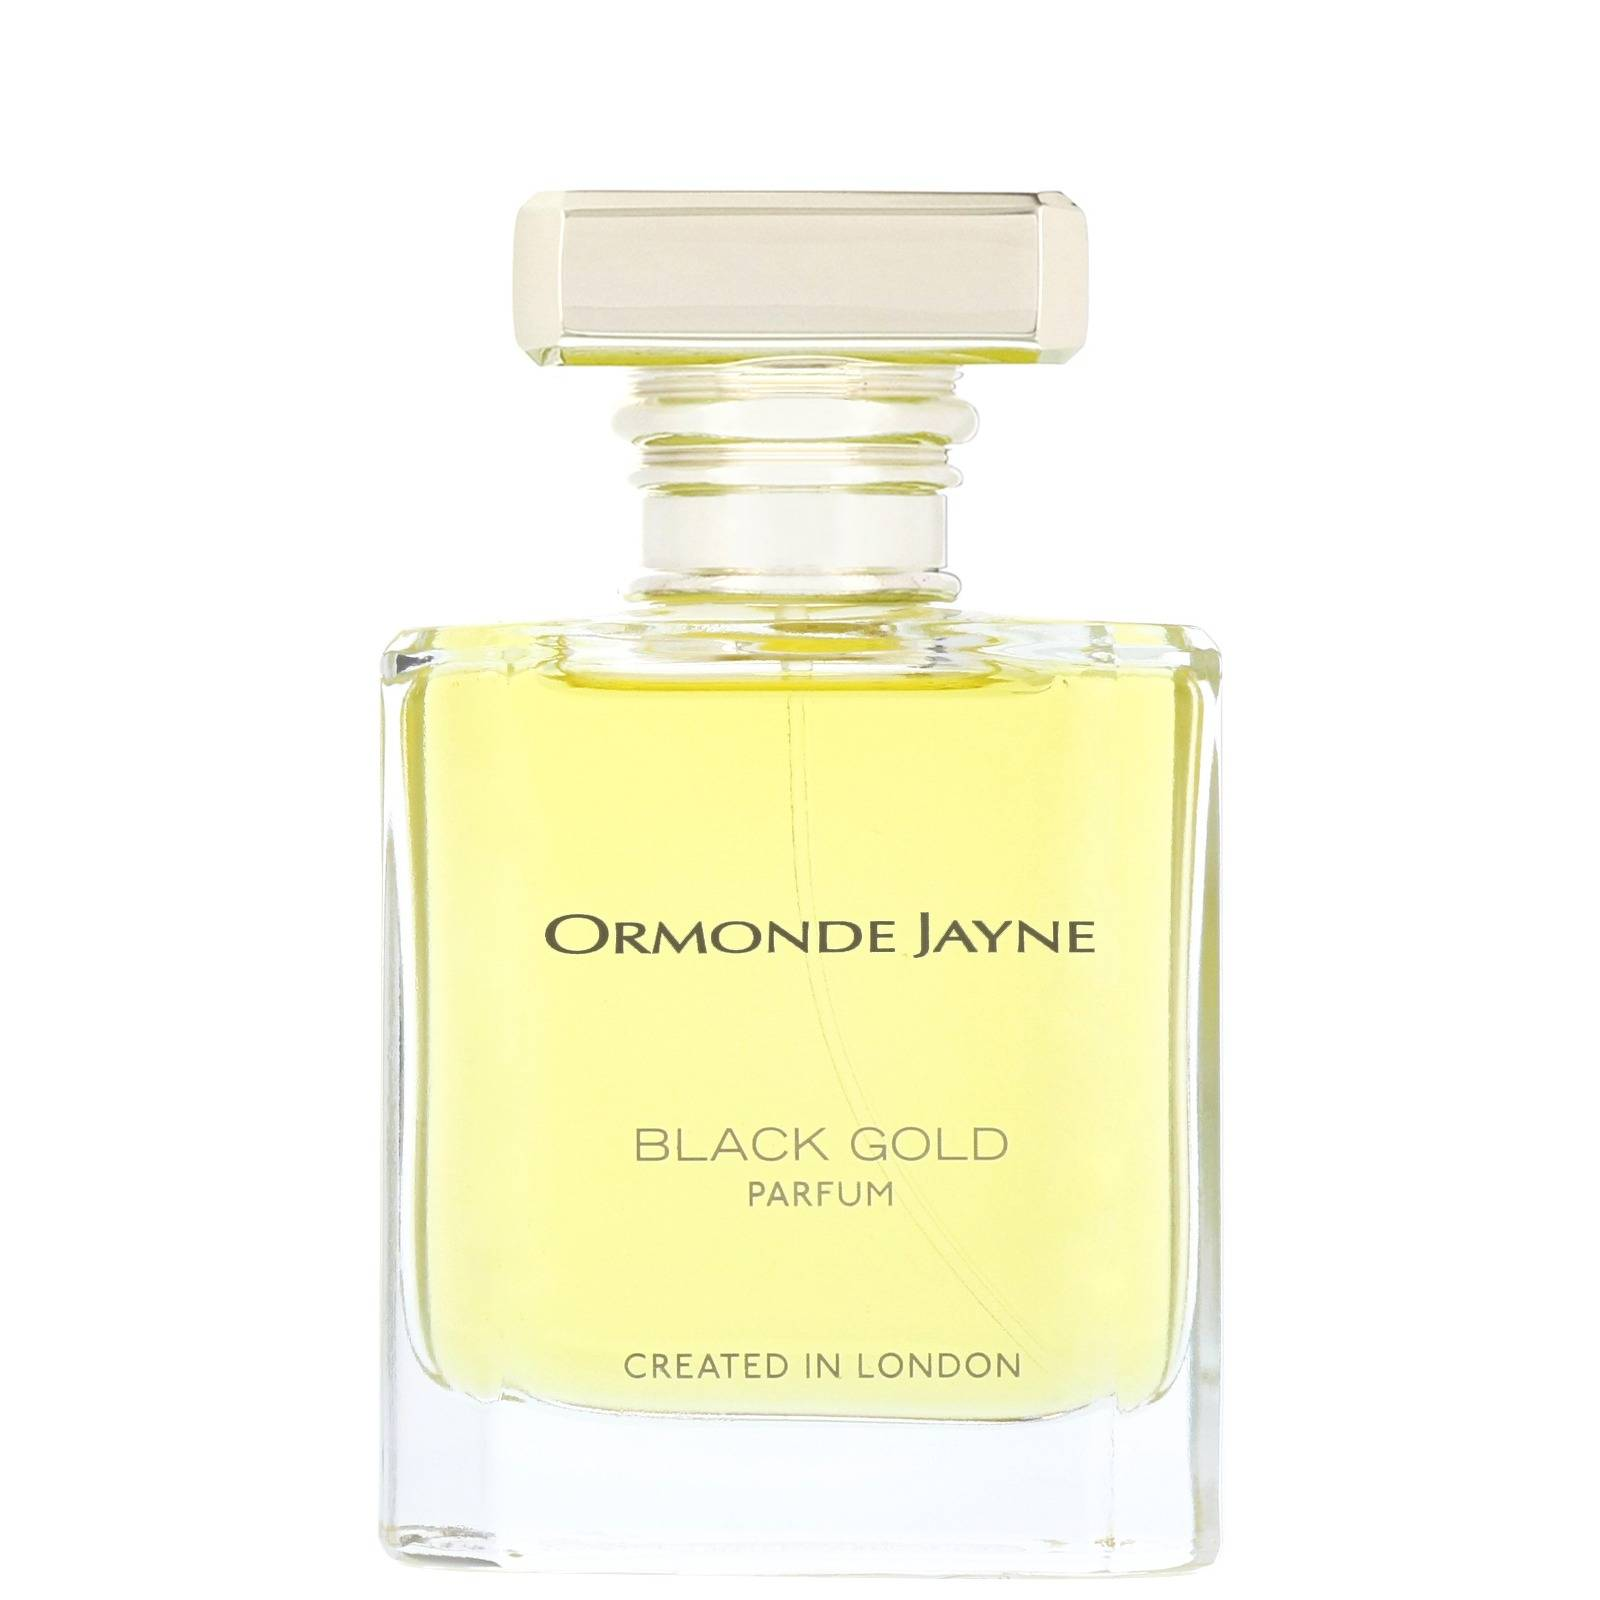 Ormonde Jayne - Black Gold 50ml Eau de Parfum Spray for Men and Women